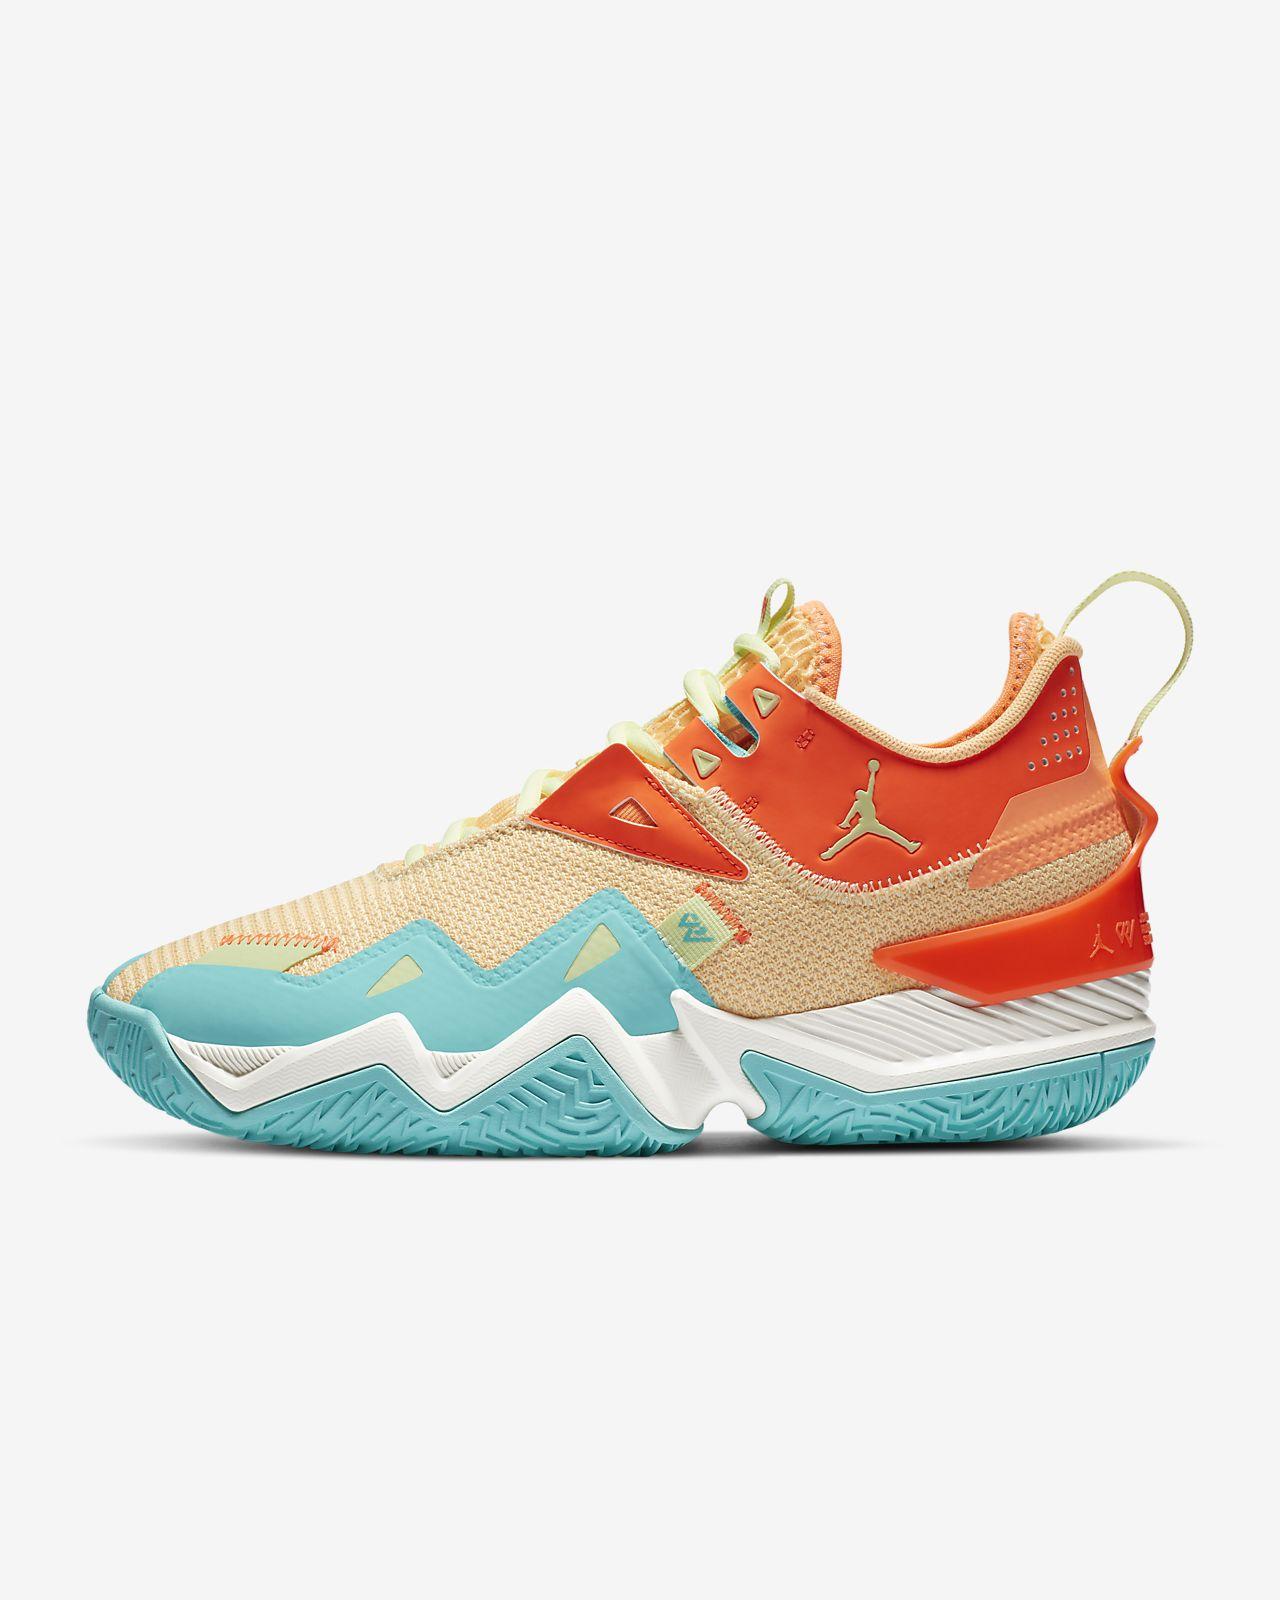 Jordan Westbrook One Take PF 男子篮球鞋